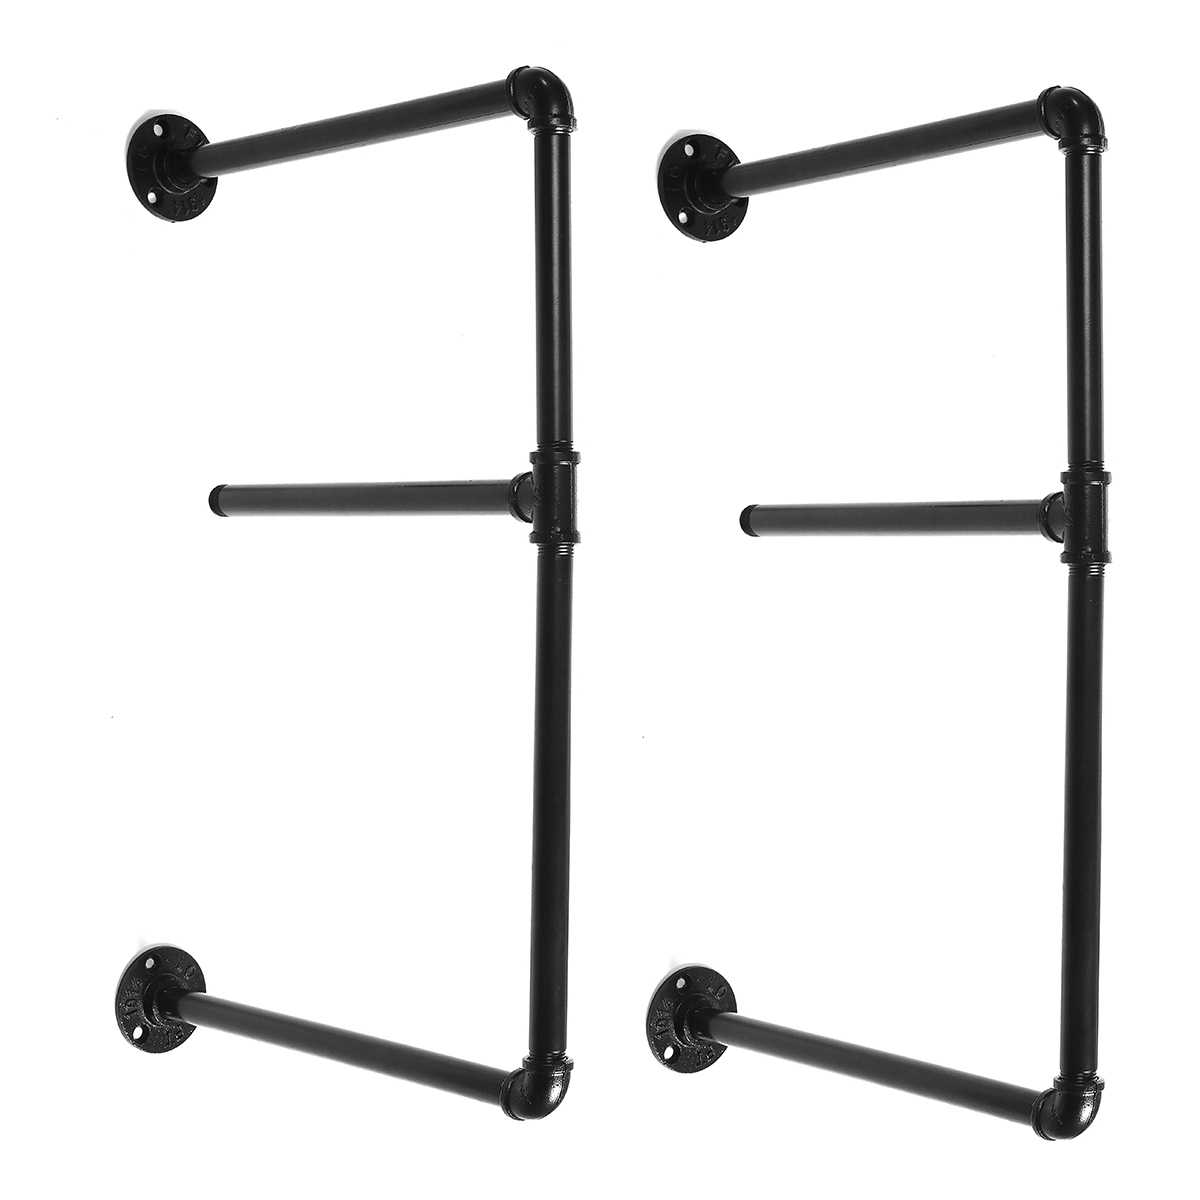 2 Pcs 2 Tier Shelf Wall Shelf Bracket Hanging Storage Shelves Iron Pipe Black Diy Pipe Shelves Furniture Home